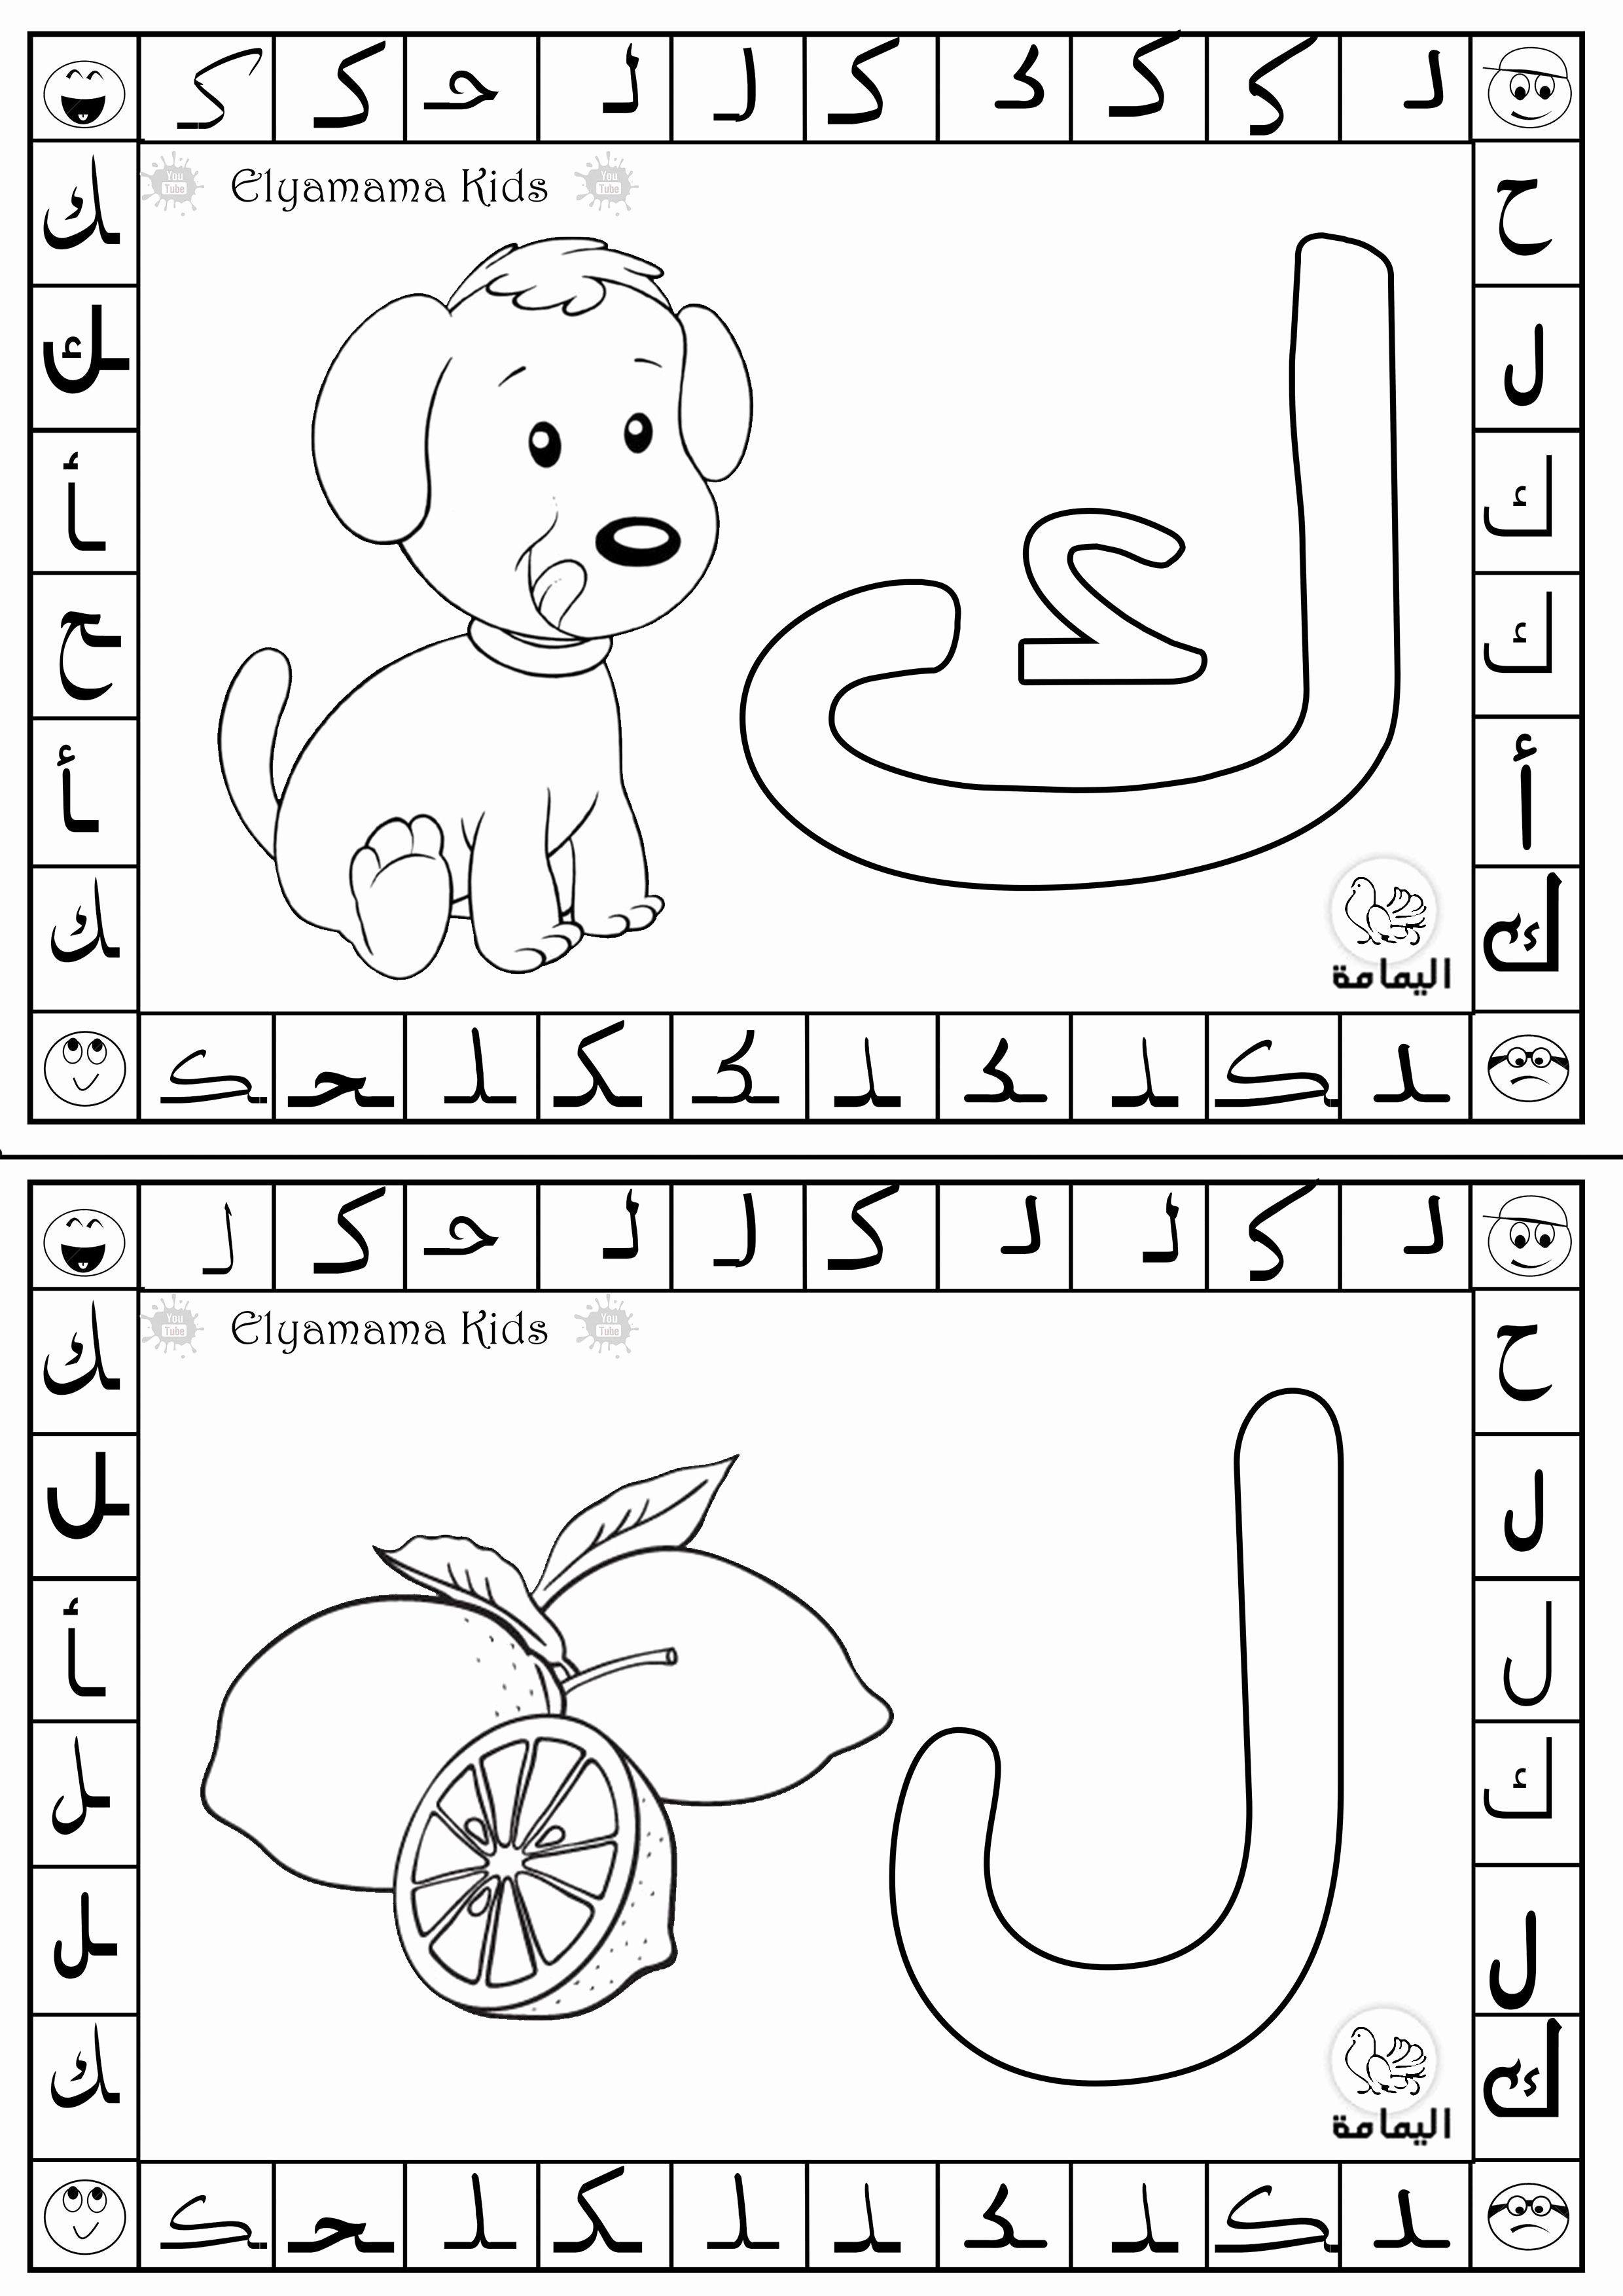 Arabic Alphabet Coloring Book Pdf | Best Coloring Pages